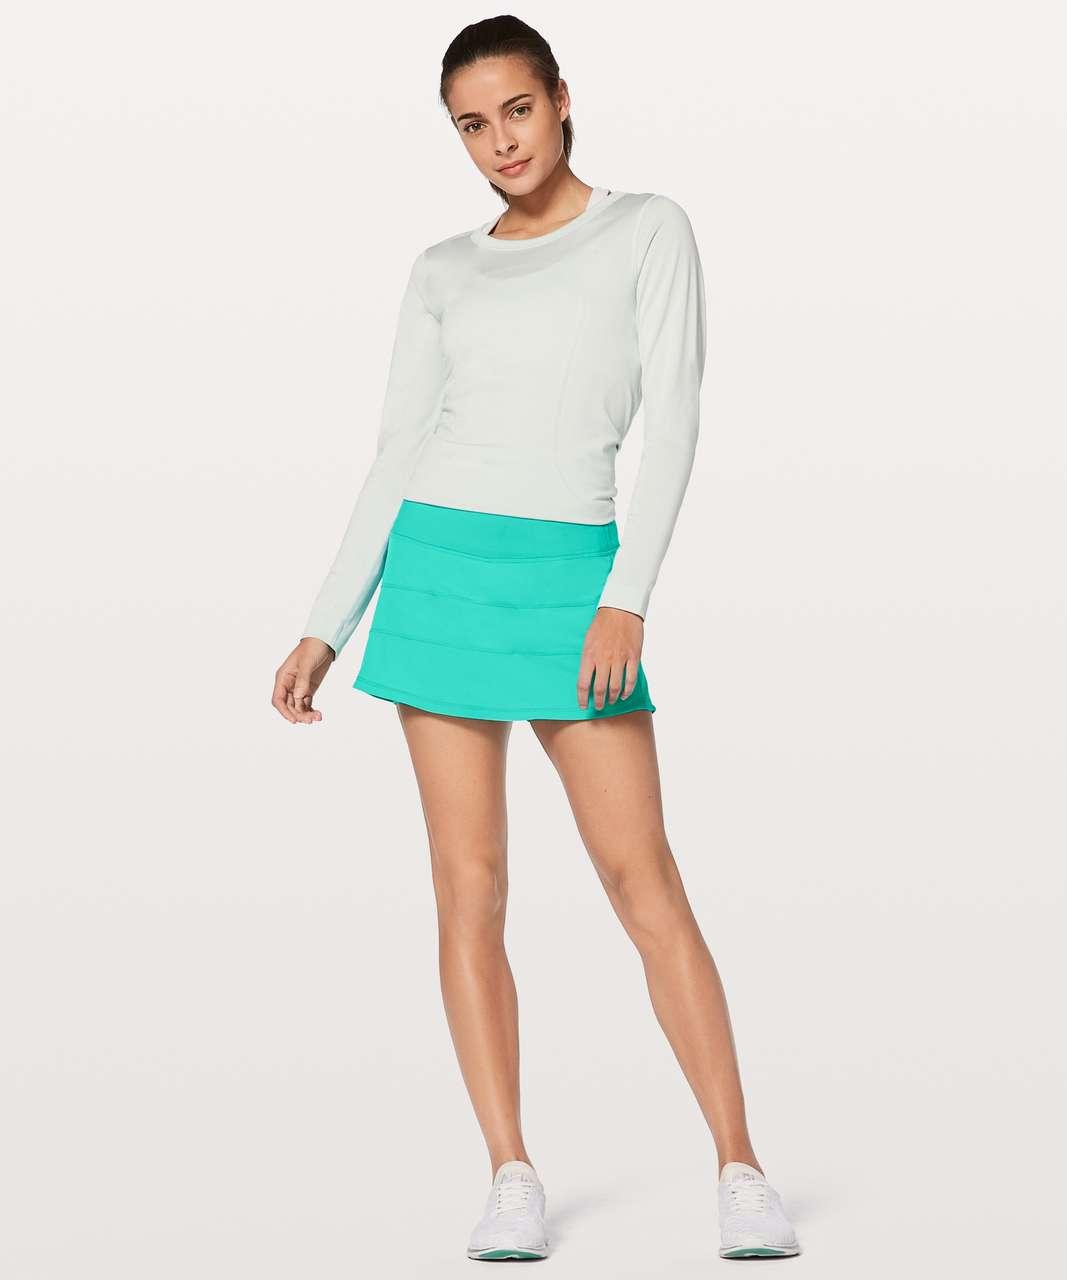 "Lululemon Pace Rival Skirt (Regular) 4-way Stretch 13"" - Eucalyptus"